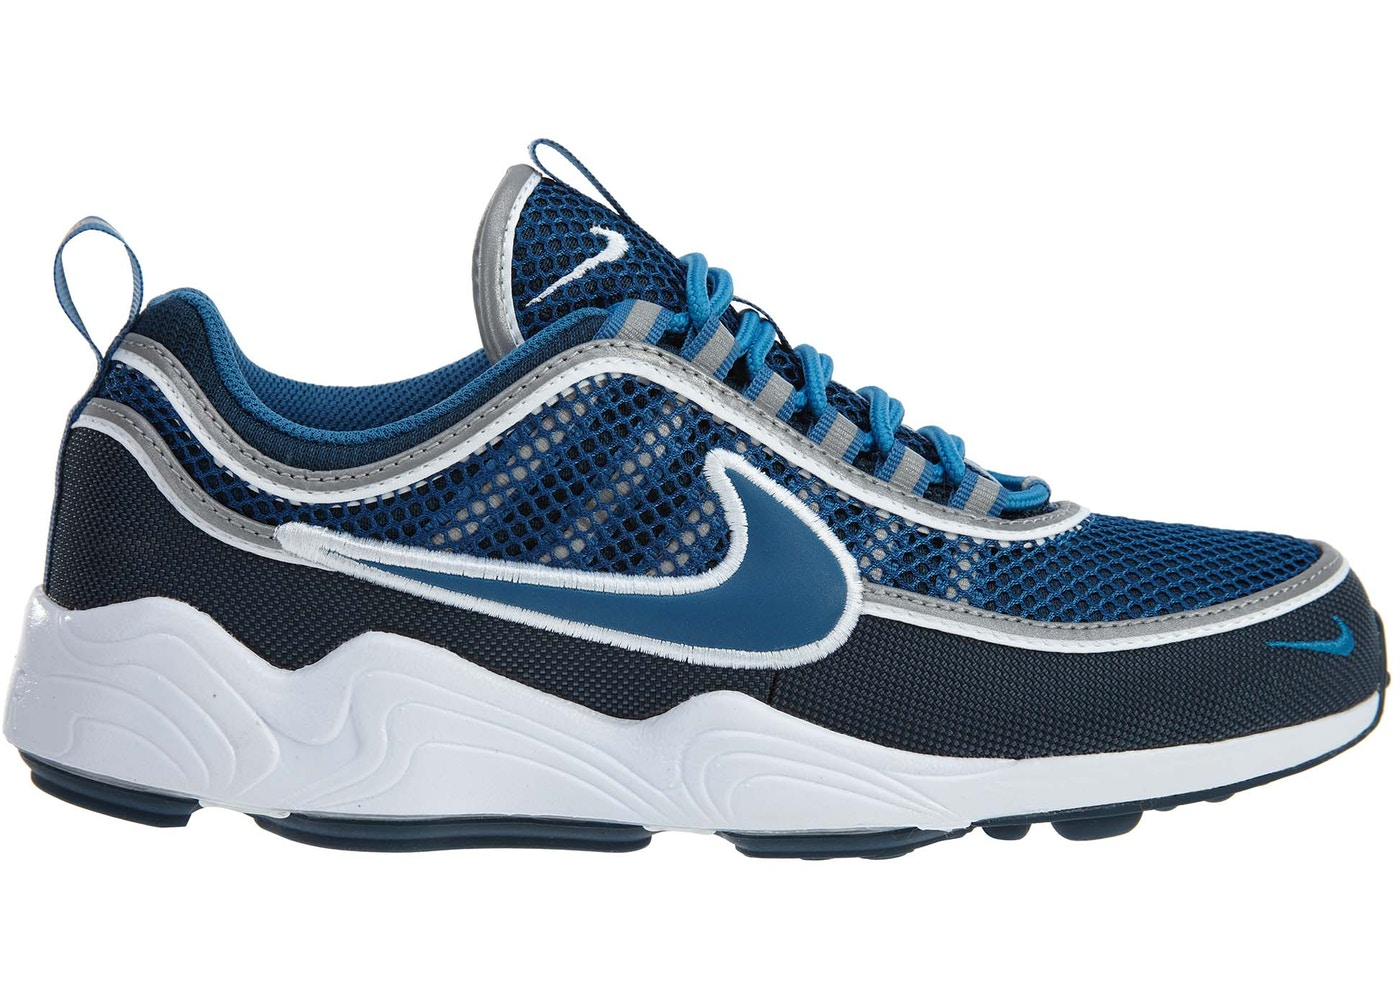 HypeAnalyzer · Nike Air Zoom Spiridon  16 Armory Navy Industrial Blue 5a6a1672f85a